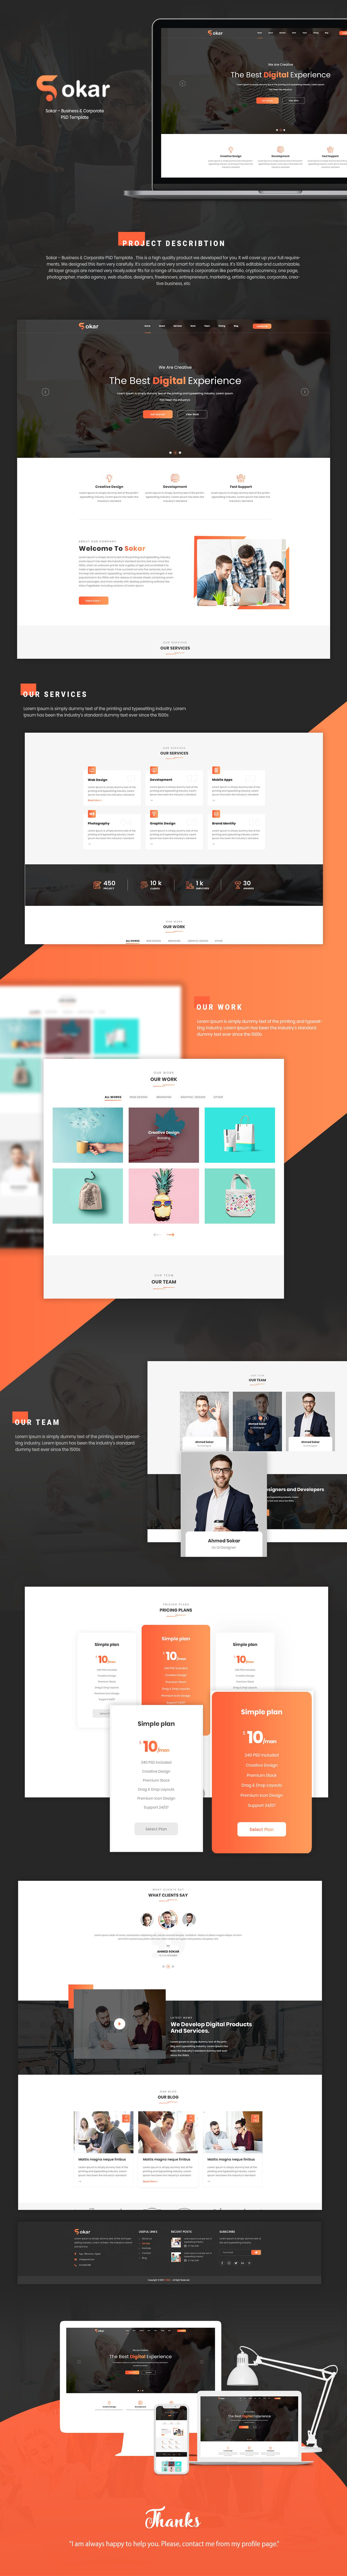 ux UI Webdesign business corporate uiuxDesigner agency marketing   creative designers